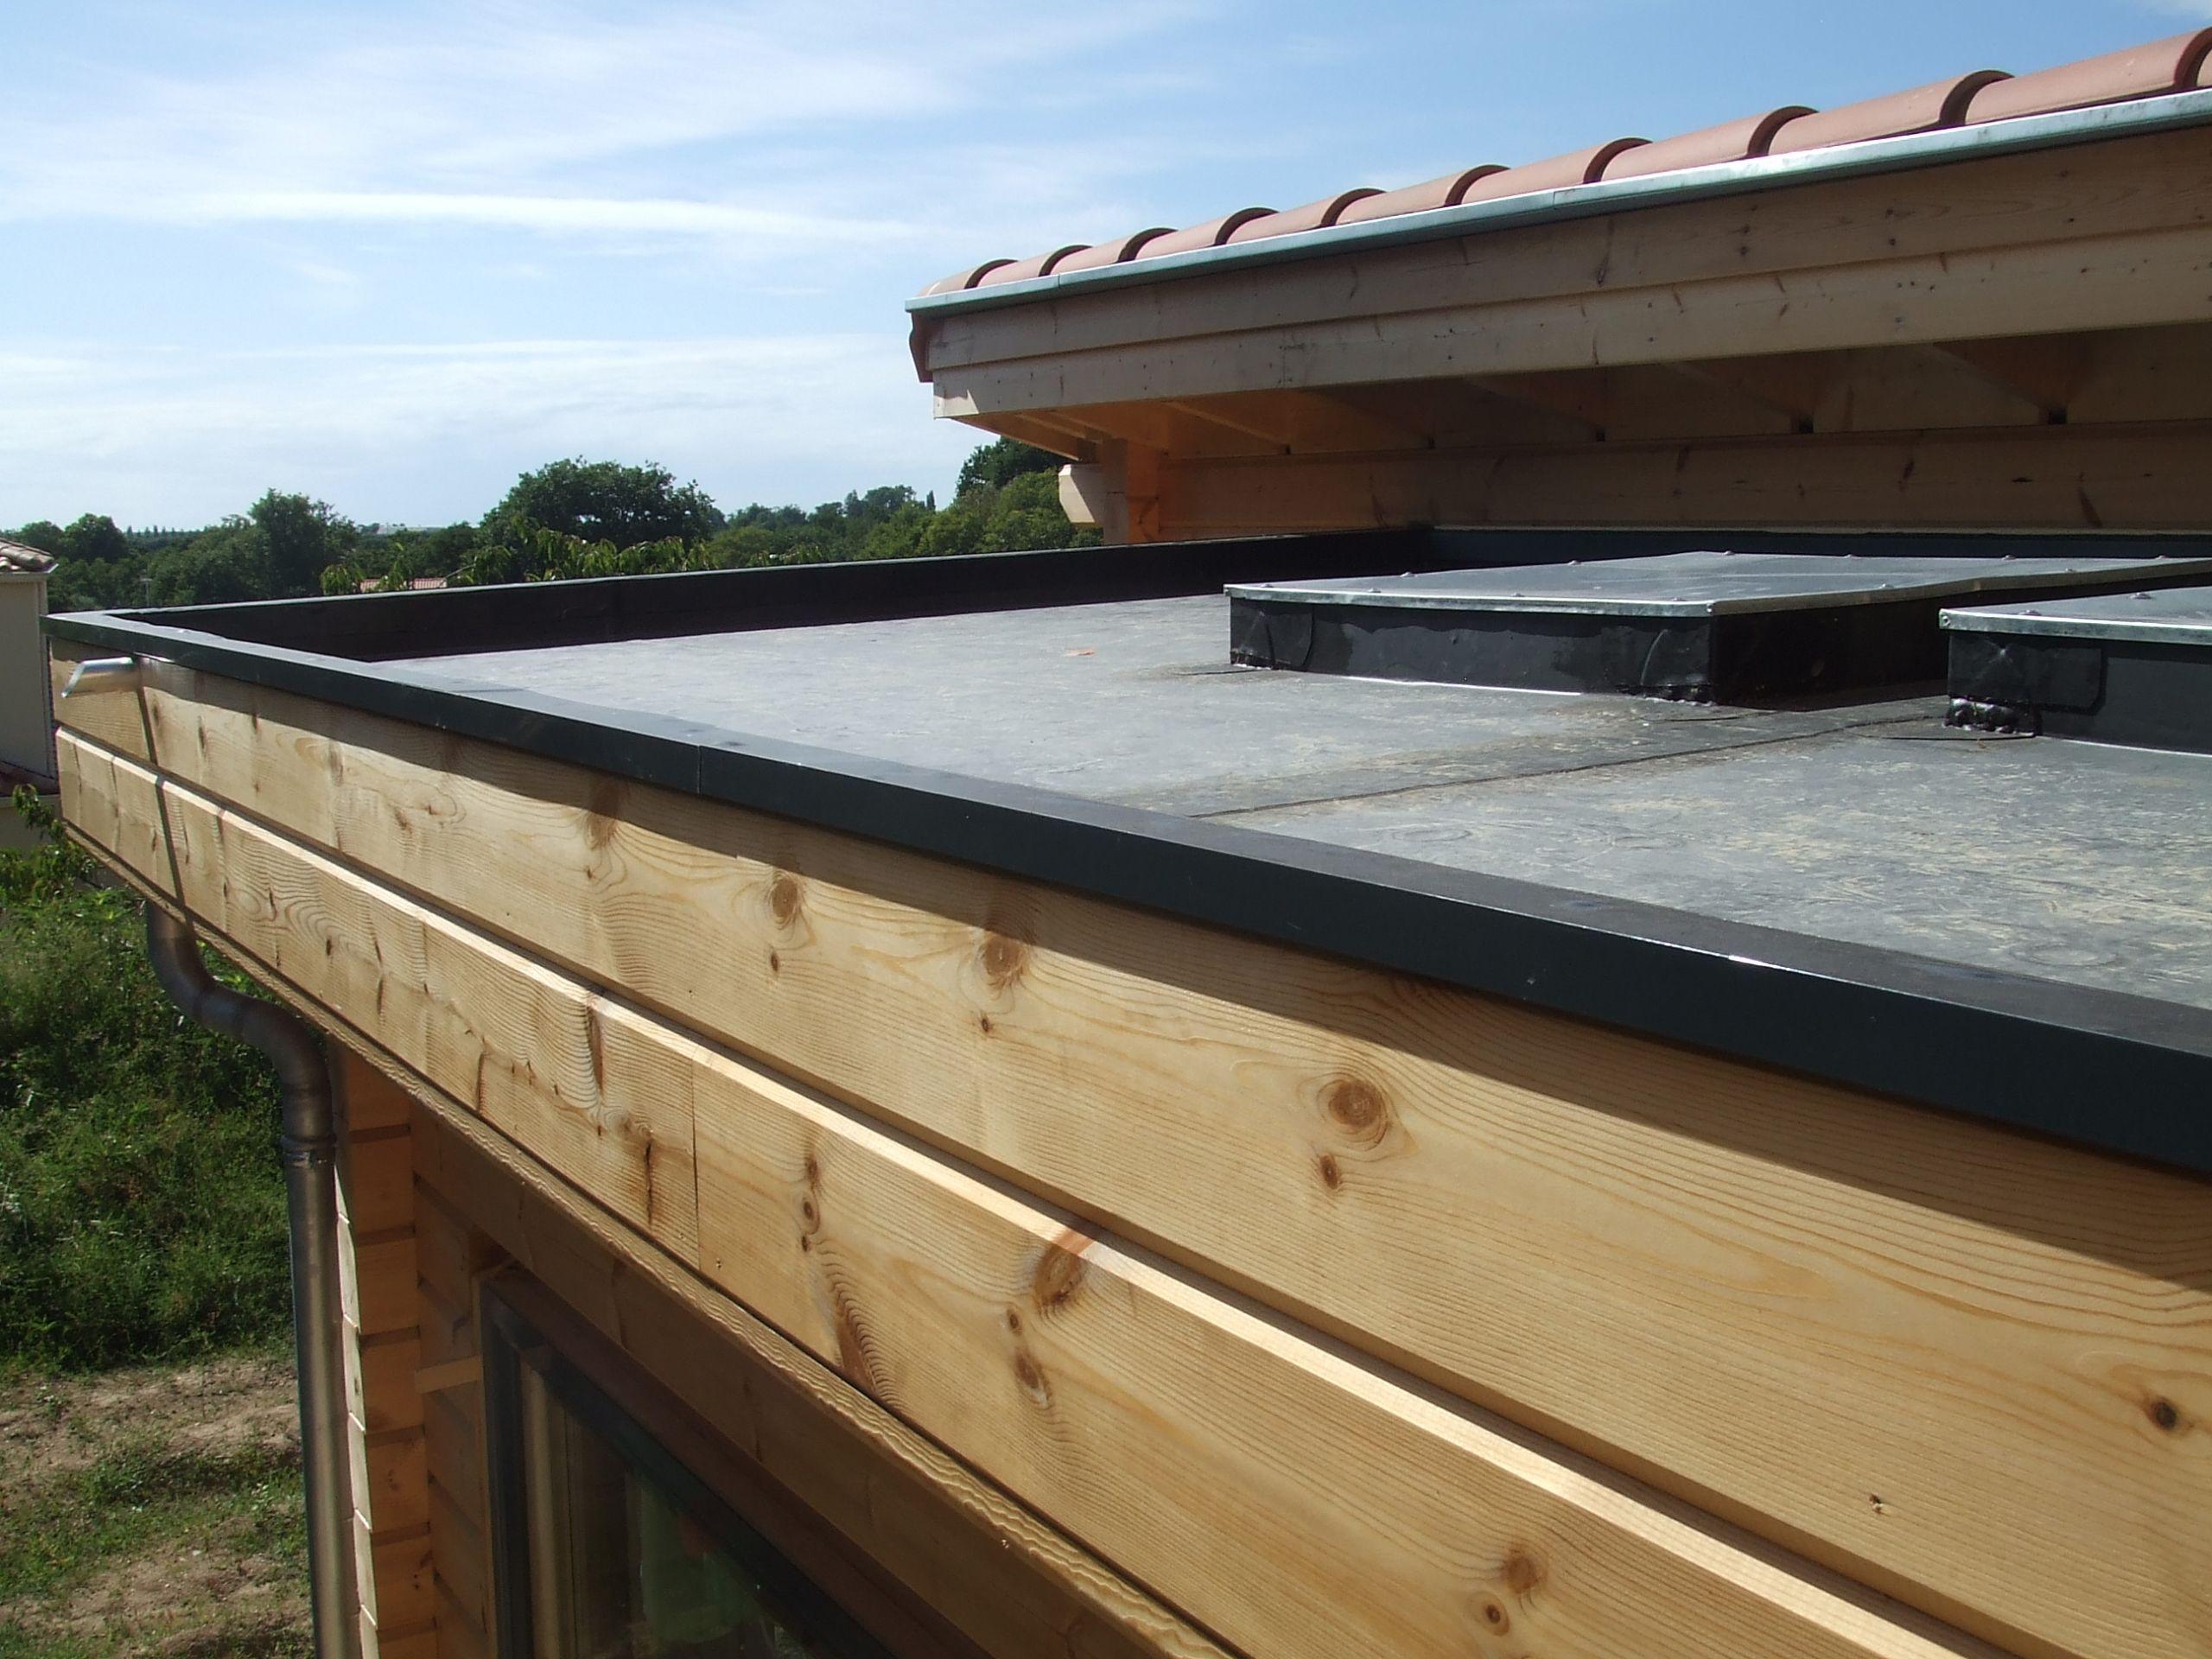 Acrotère toiture Terrasse Concept - Idees Conception ...